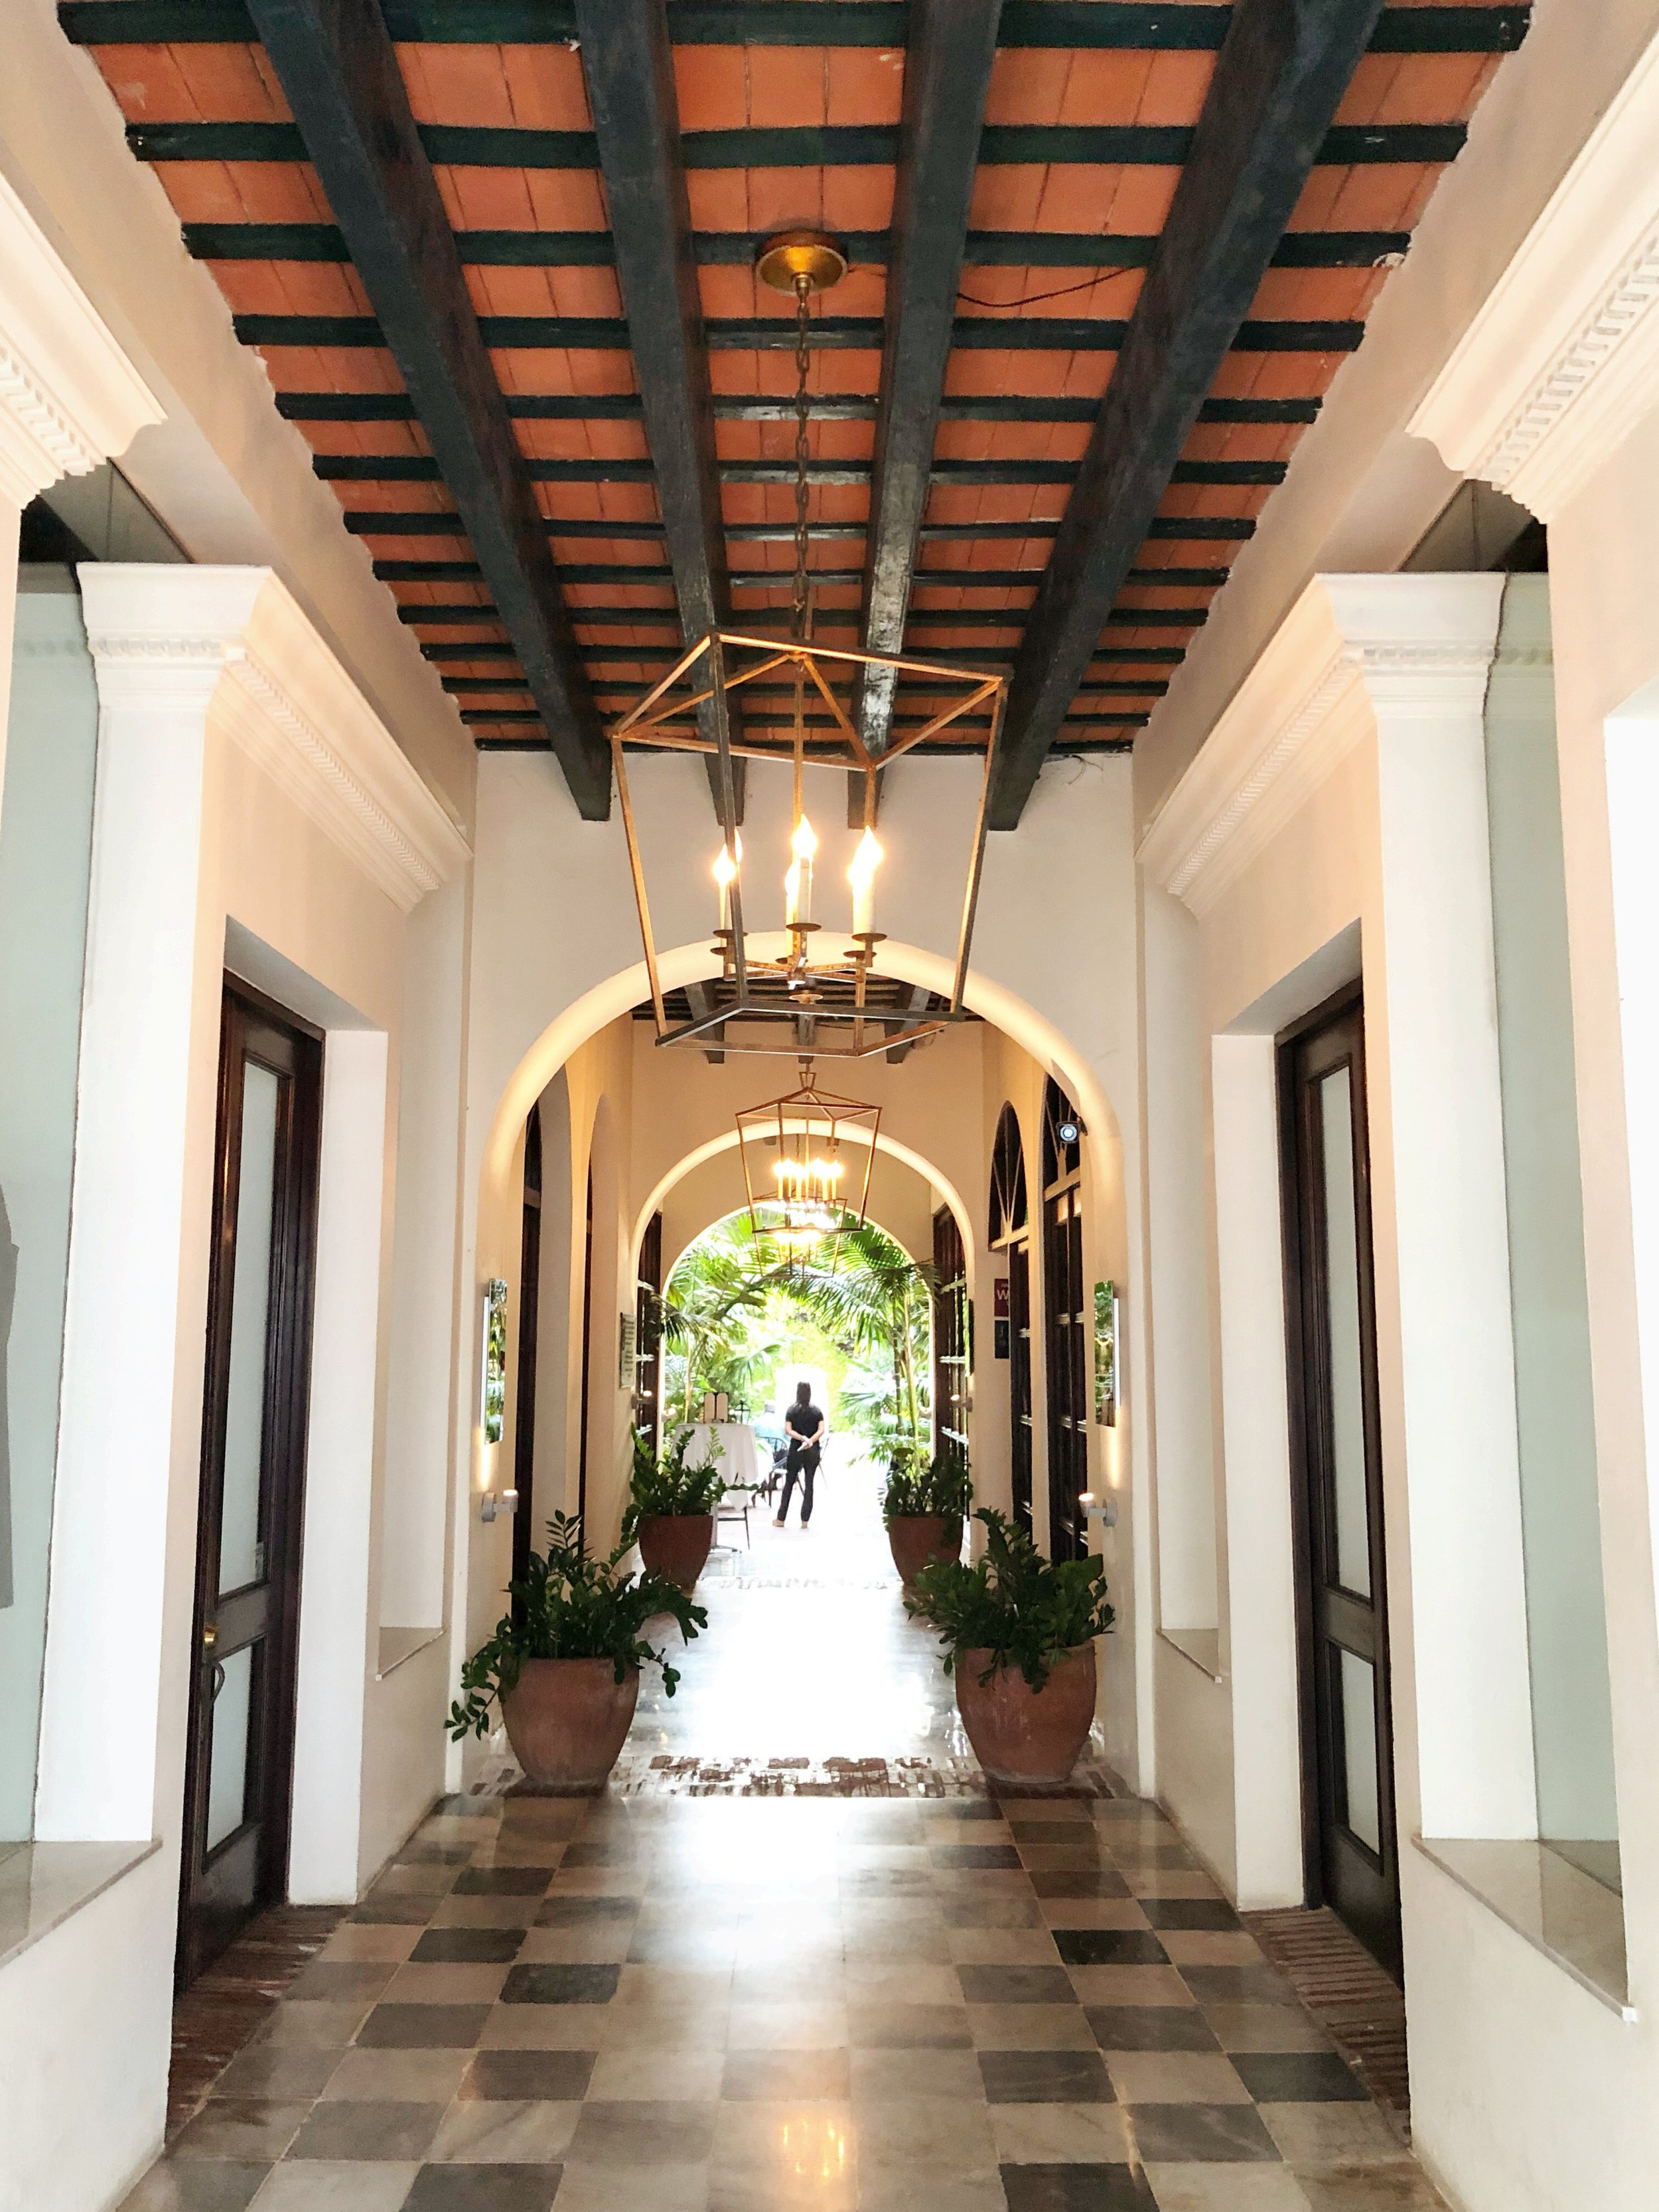 Walked past this gorgeous restaurant in Old San Juan - La Lanterna.